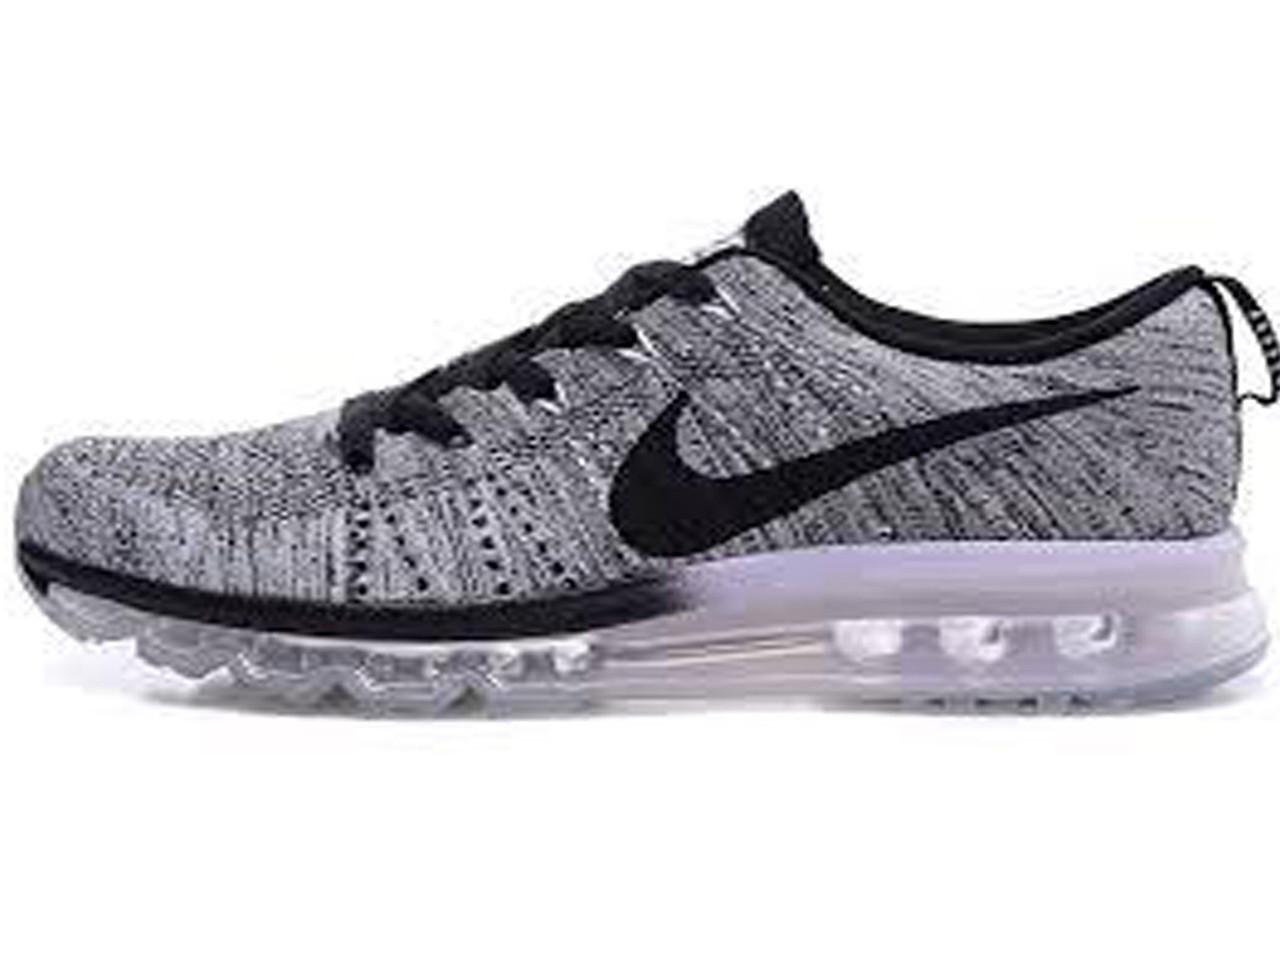 35c4bd34 Мужские кроссовки Nike Flyknit Max 2014 Gray (Реплика ААА+) - Rocket Shoes -